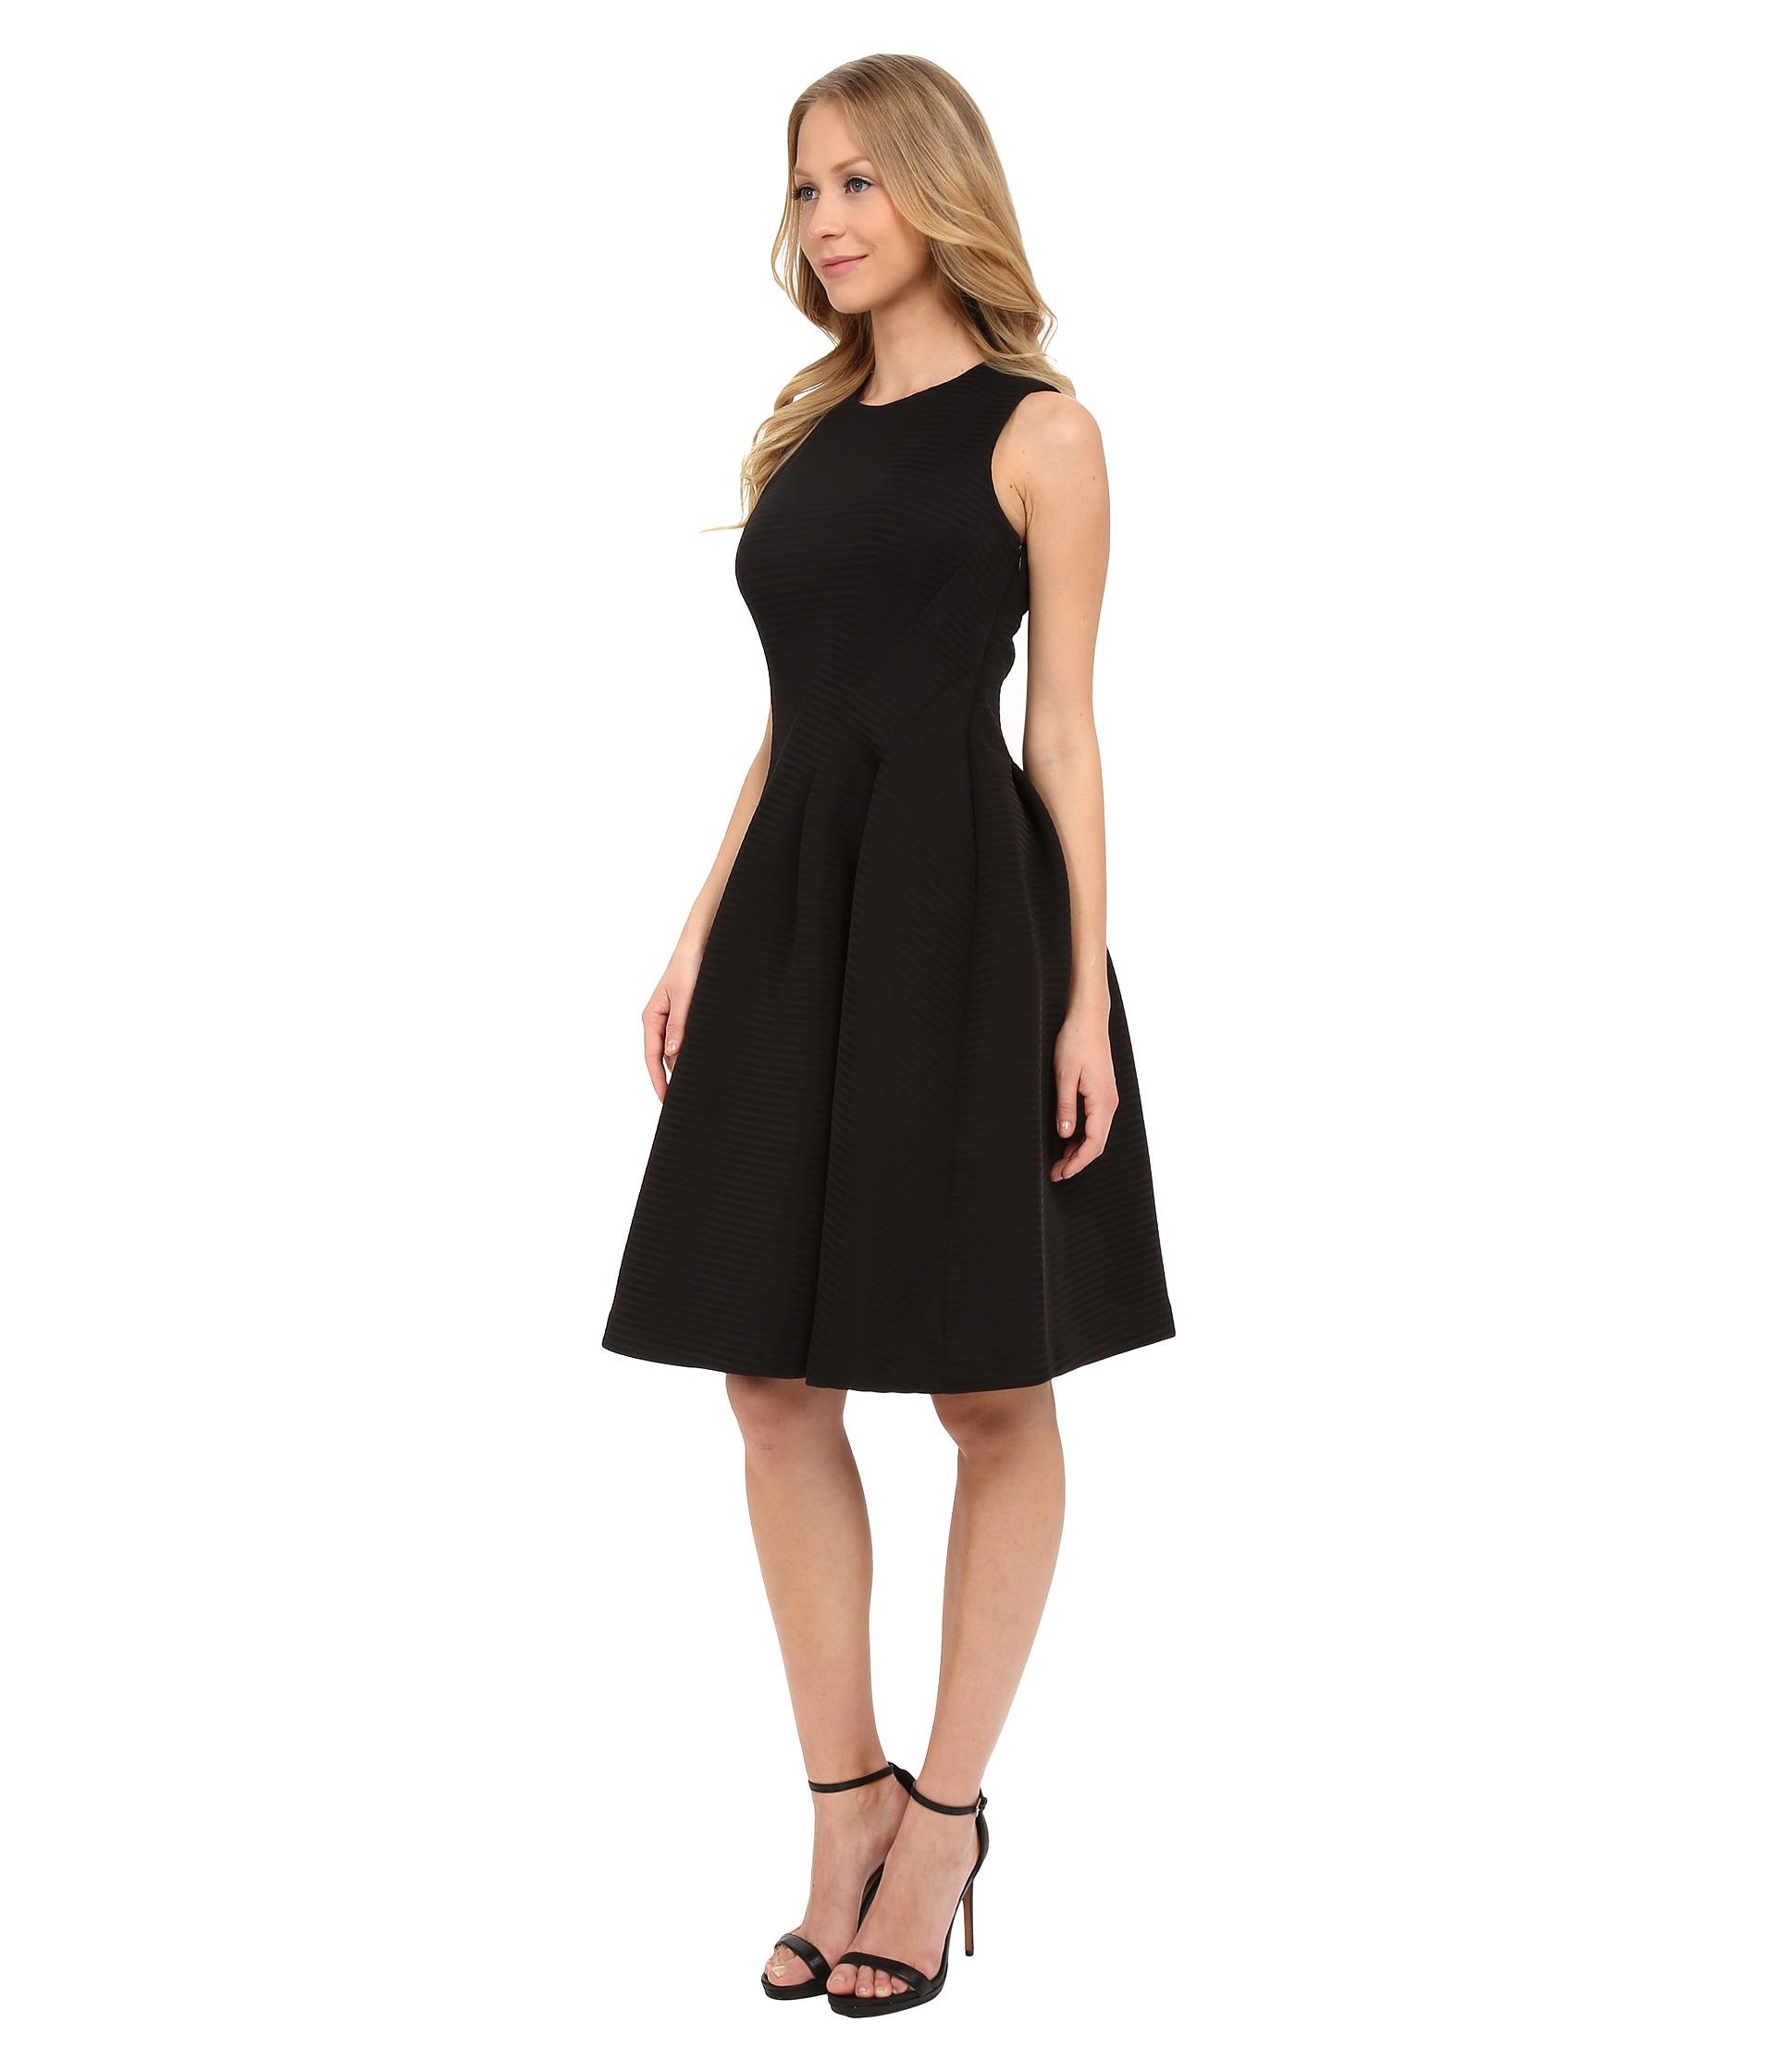 Lyst - Calvin Klein Fit & Flare Dress in Black